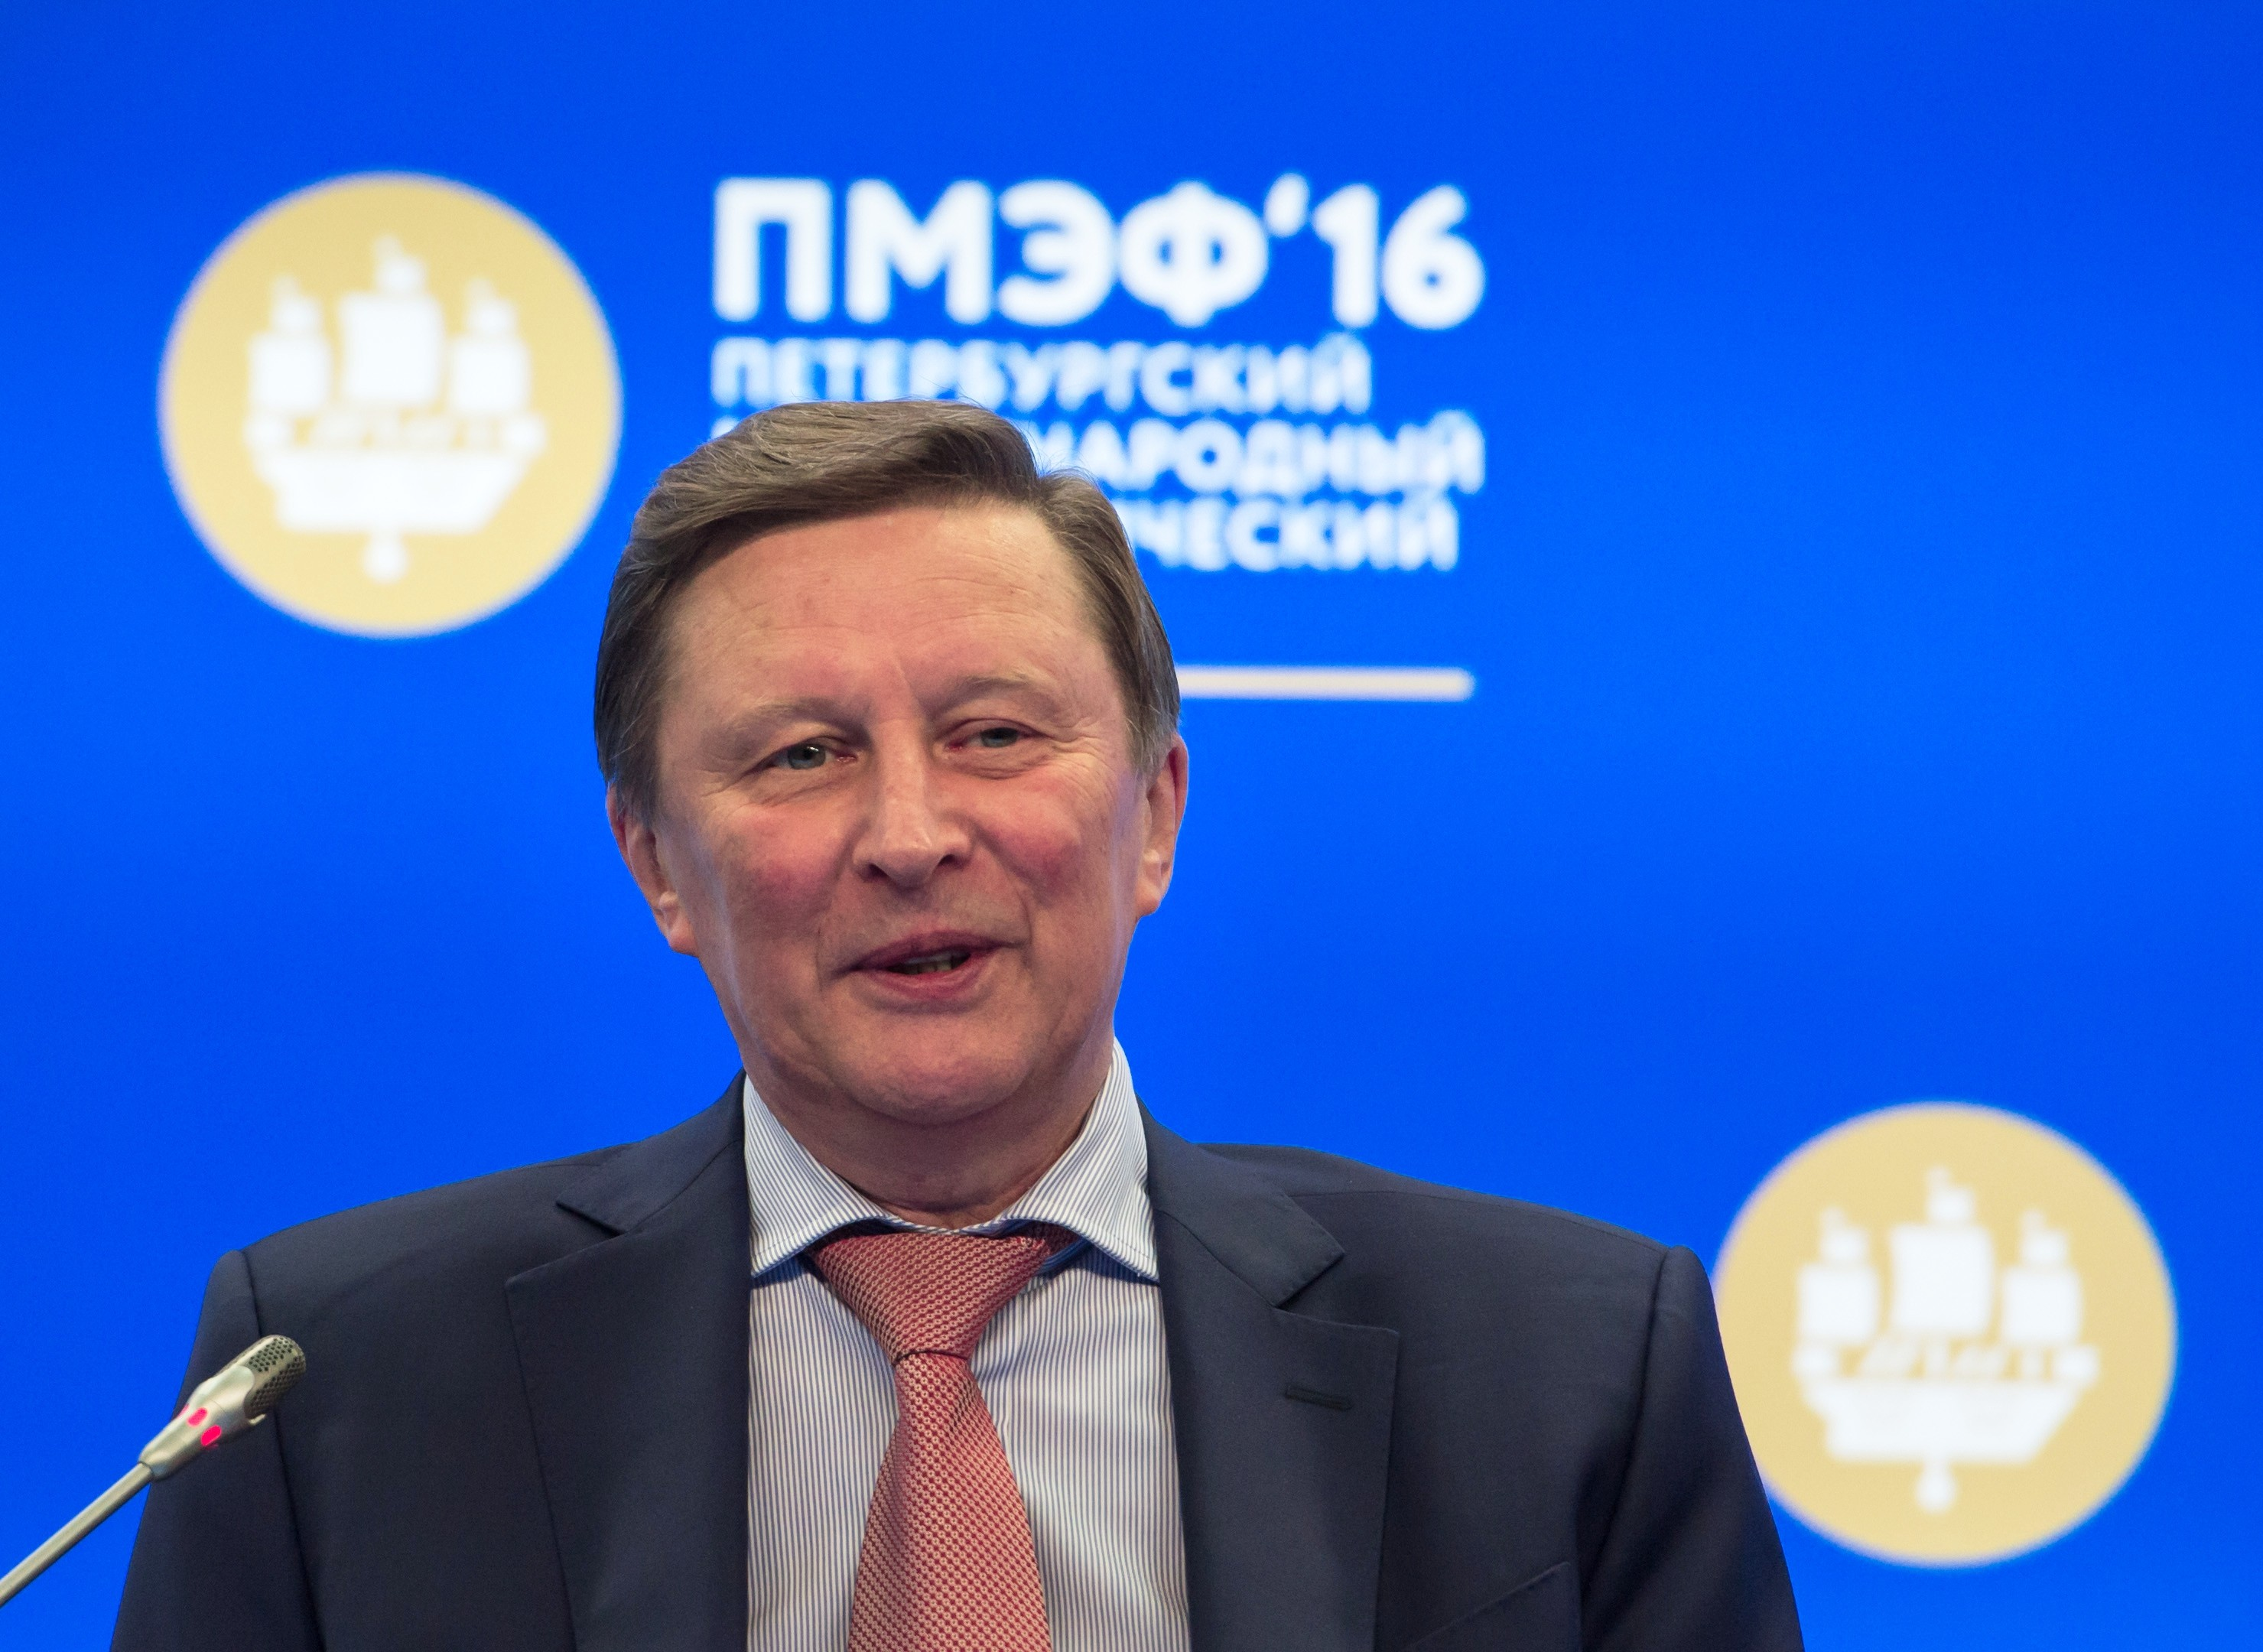 <p>Фото: &copy;РИА Новости\Алексей Даничев</p>